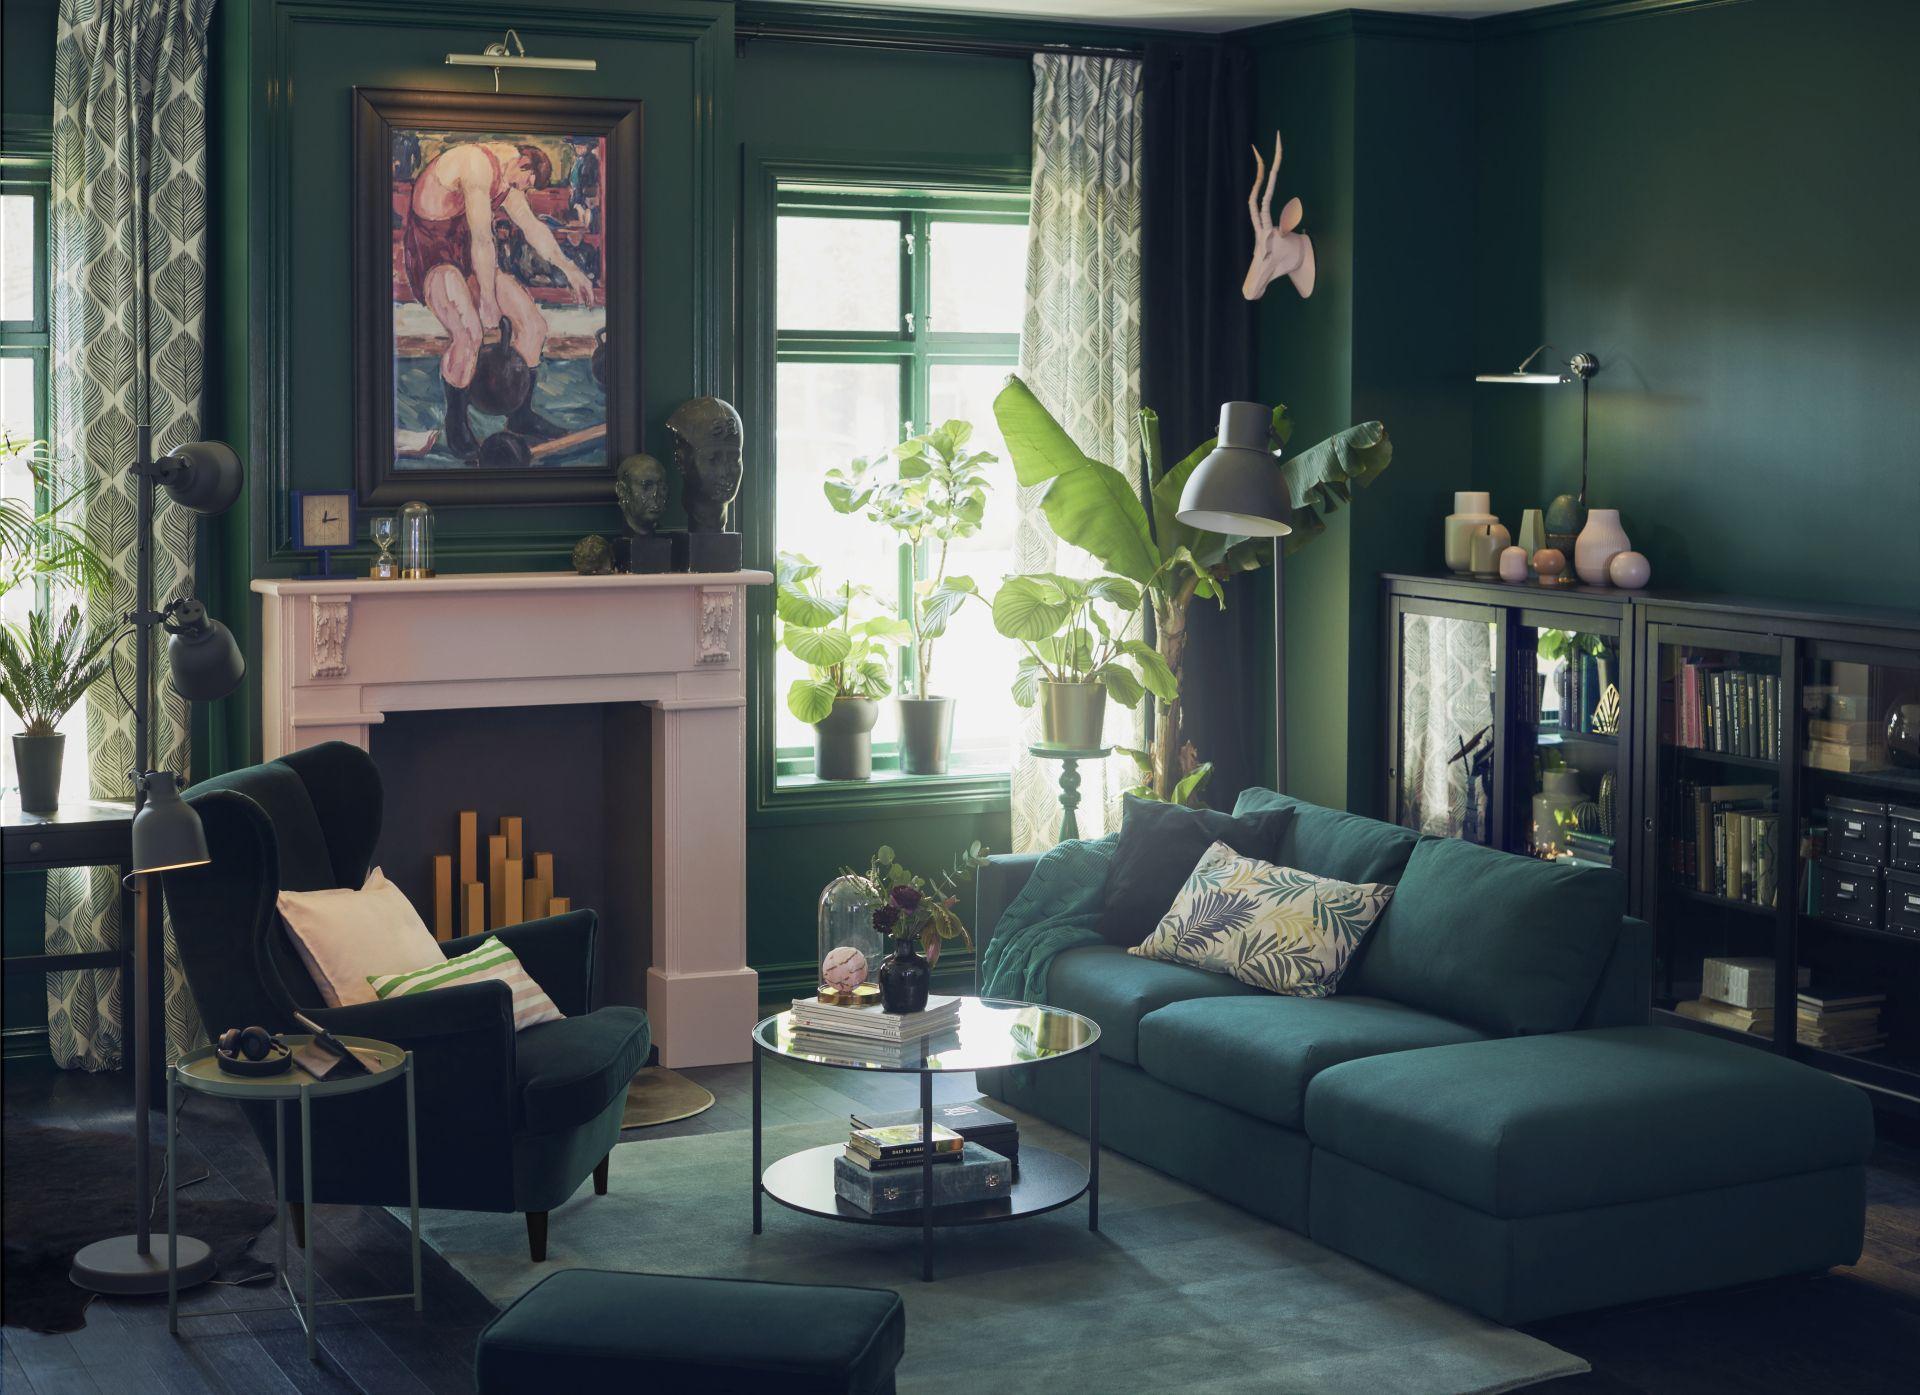 Poltrona Kivik Ikea.Kivik Sofa De Canto 4 Lugares Hillared Bege In 2019 A